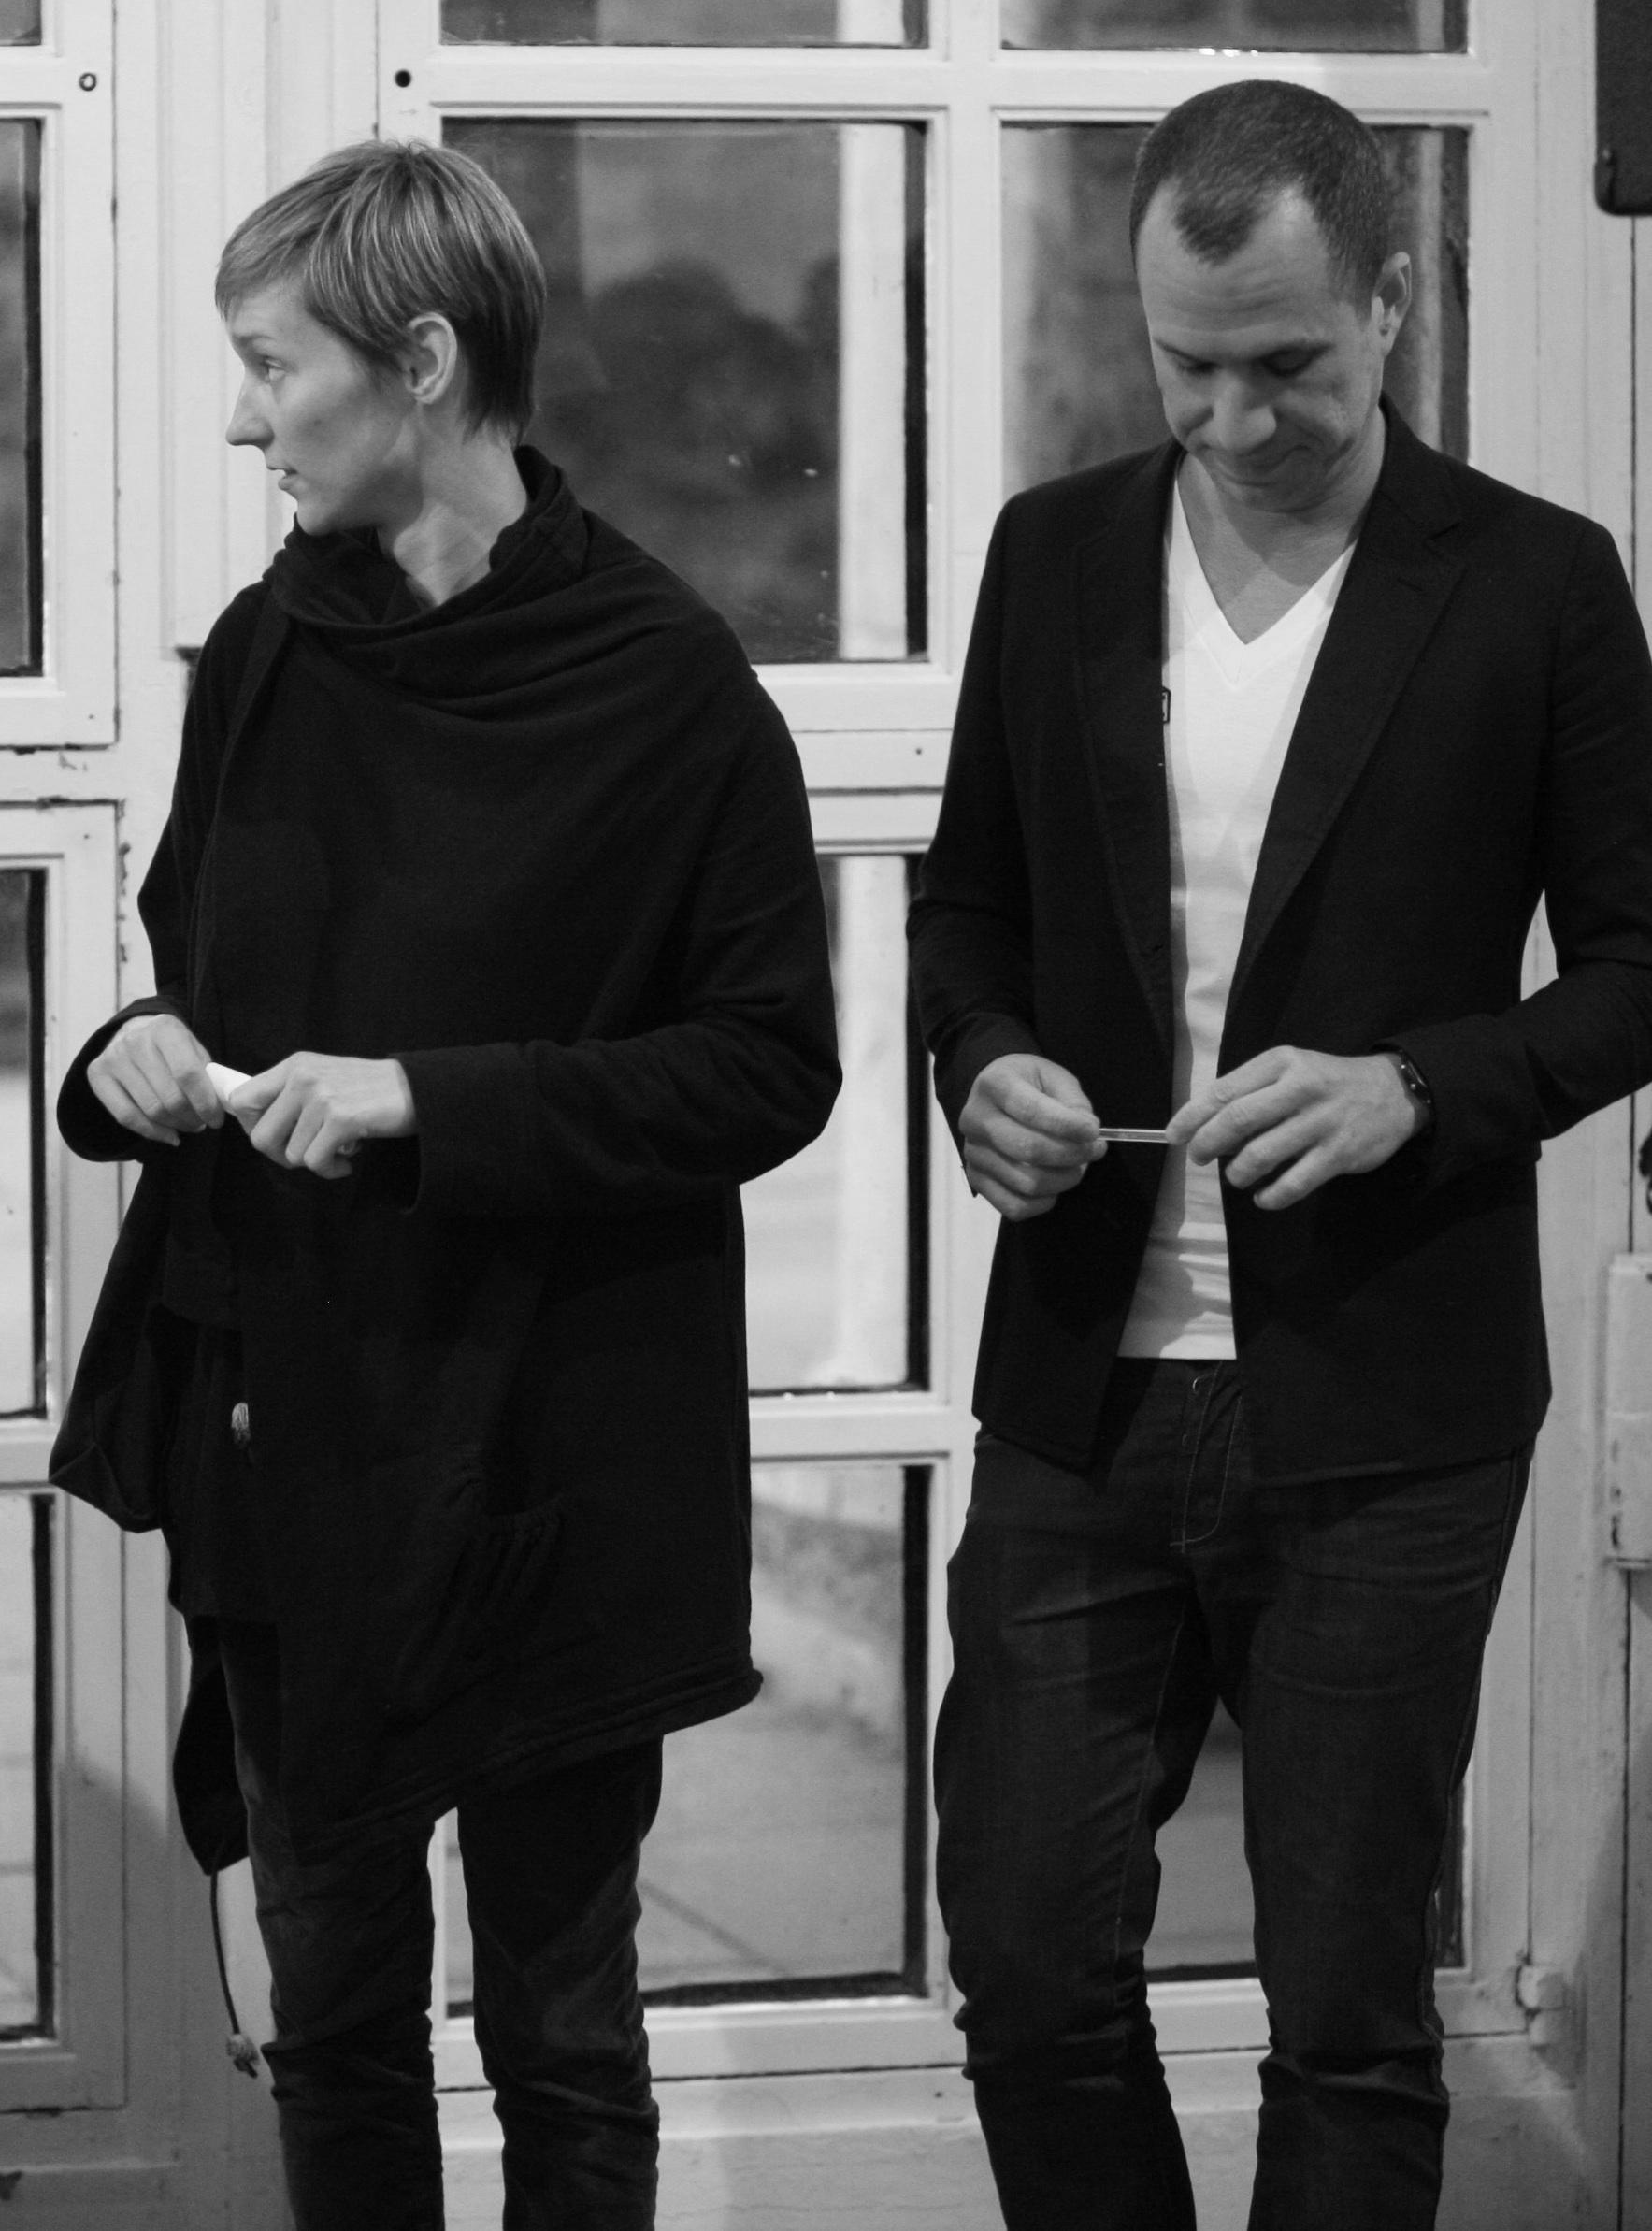 Haus der Kunst, 13.06.2008, Allora & Calzadilla. Foto: Marion Vogel